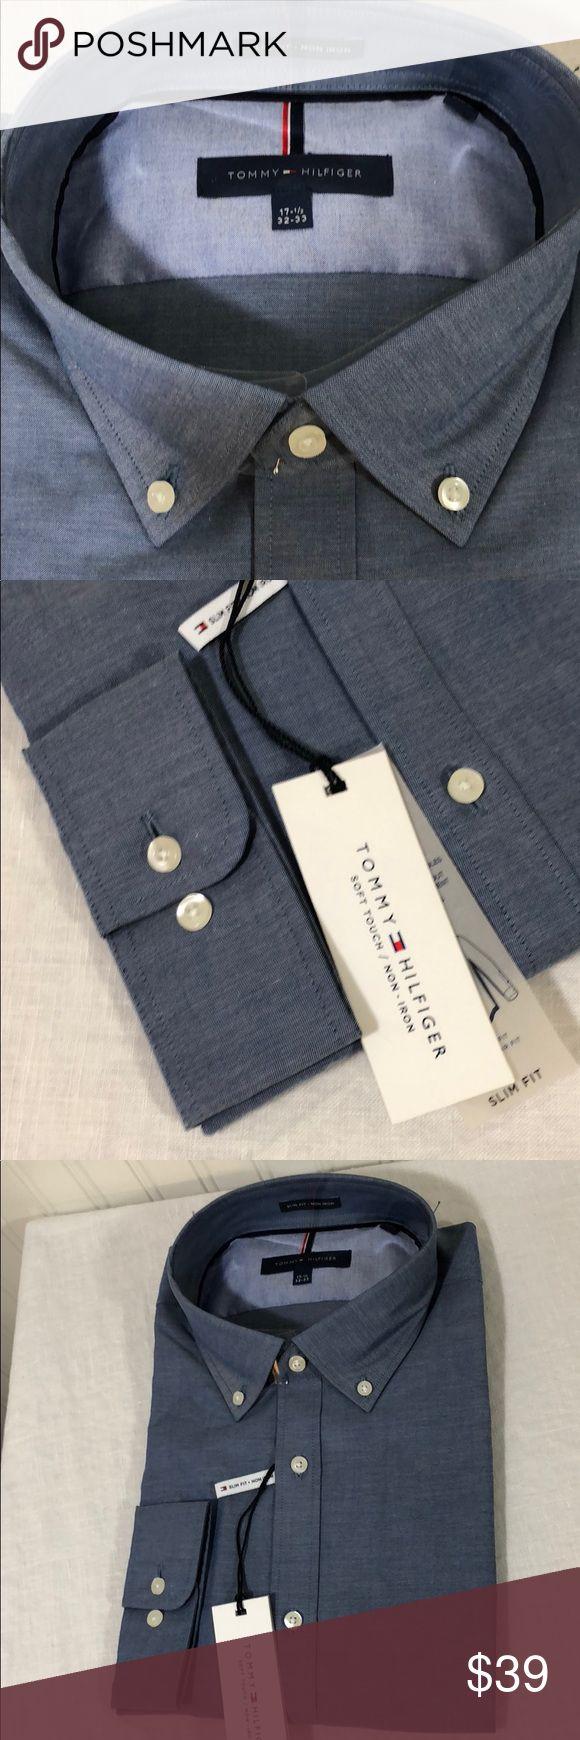 "Tommy Hilfiger Men's Slim Fit Non Iron Chambray Tommy Hilfiger Men's Slim Fit Non Iron Chambray Solid Dress Shirt, Denim, 17.5"". B90 Tommy Hilfiger Shirts Dress Shirts"